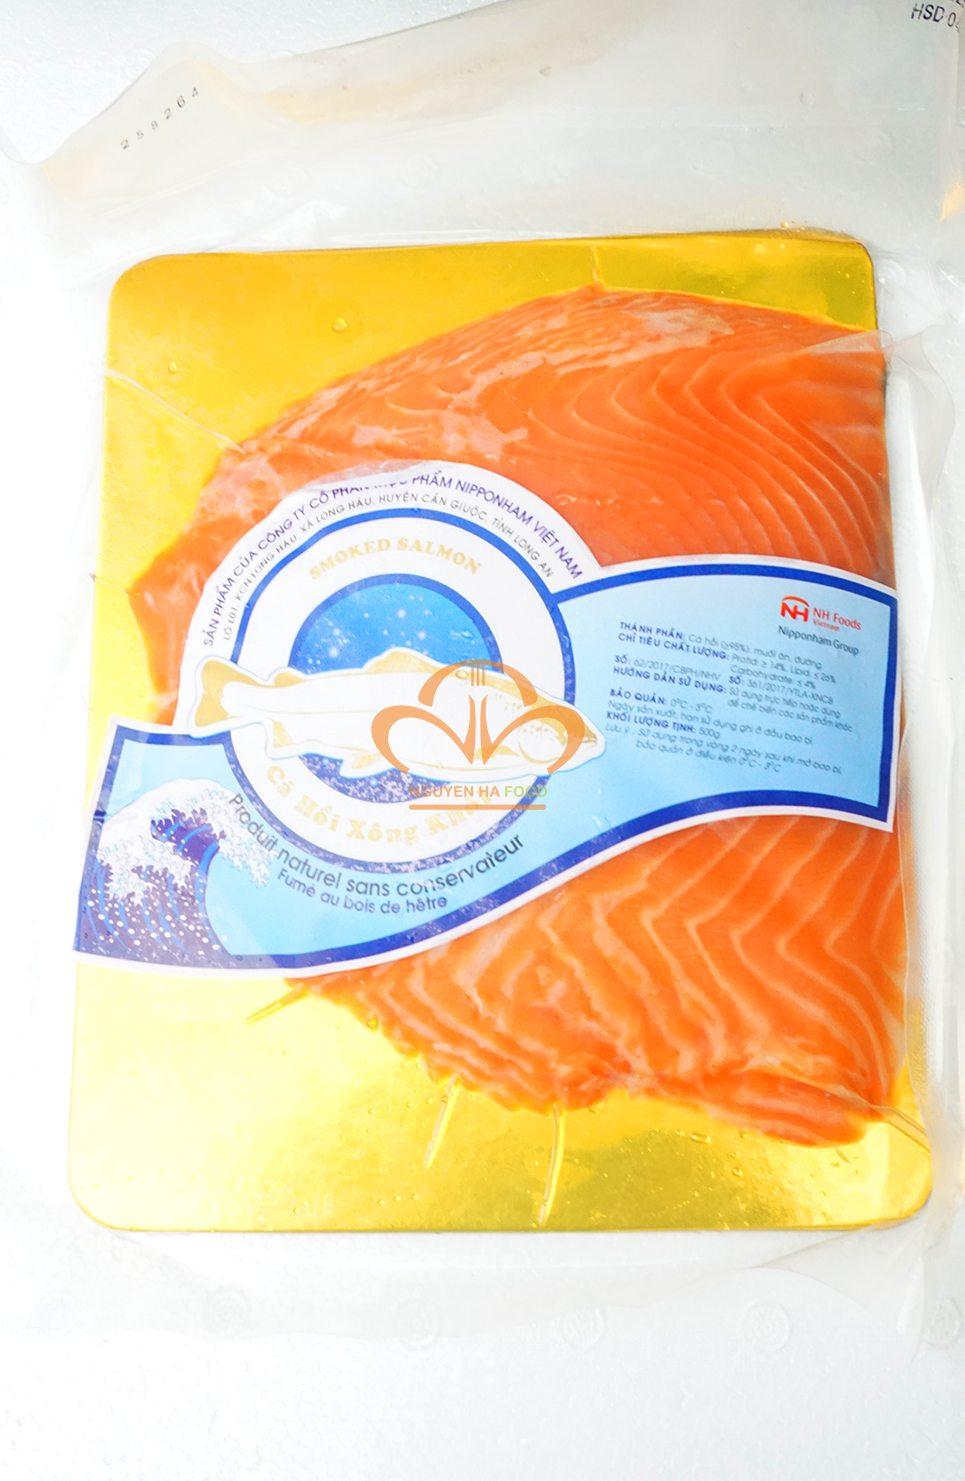 thit-ca-hoi-xong-khoi-co-nguyen-mieng-da-smoked-salmon-skin-on-1